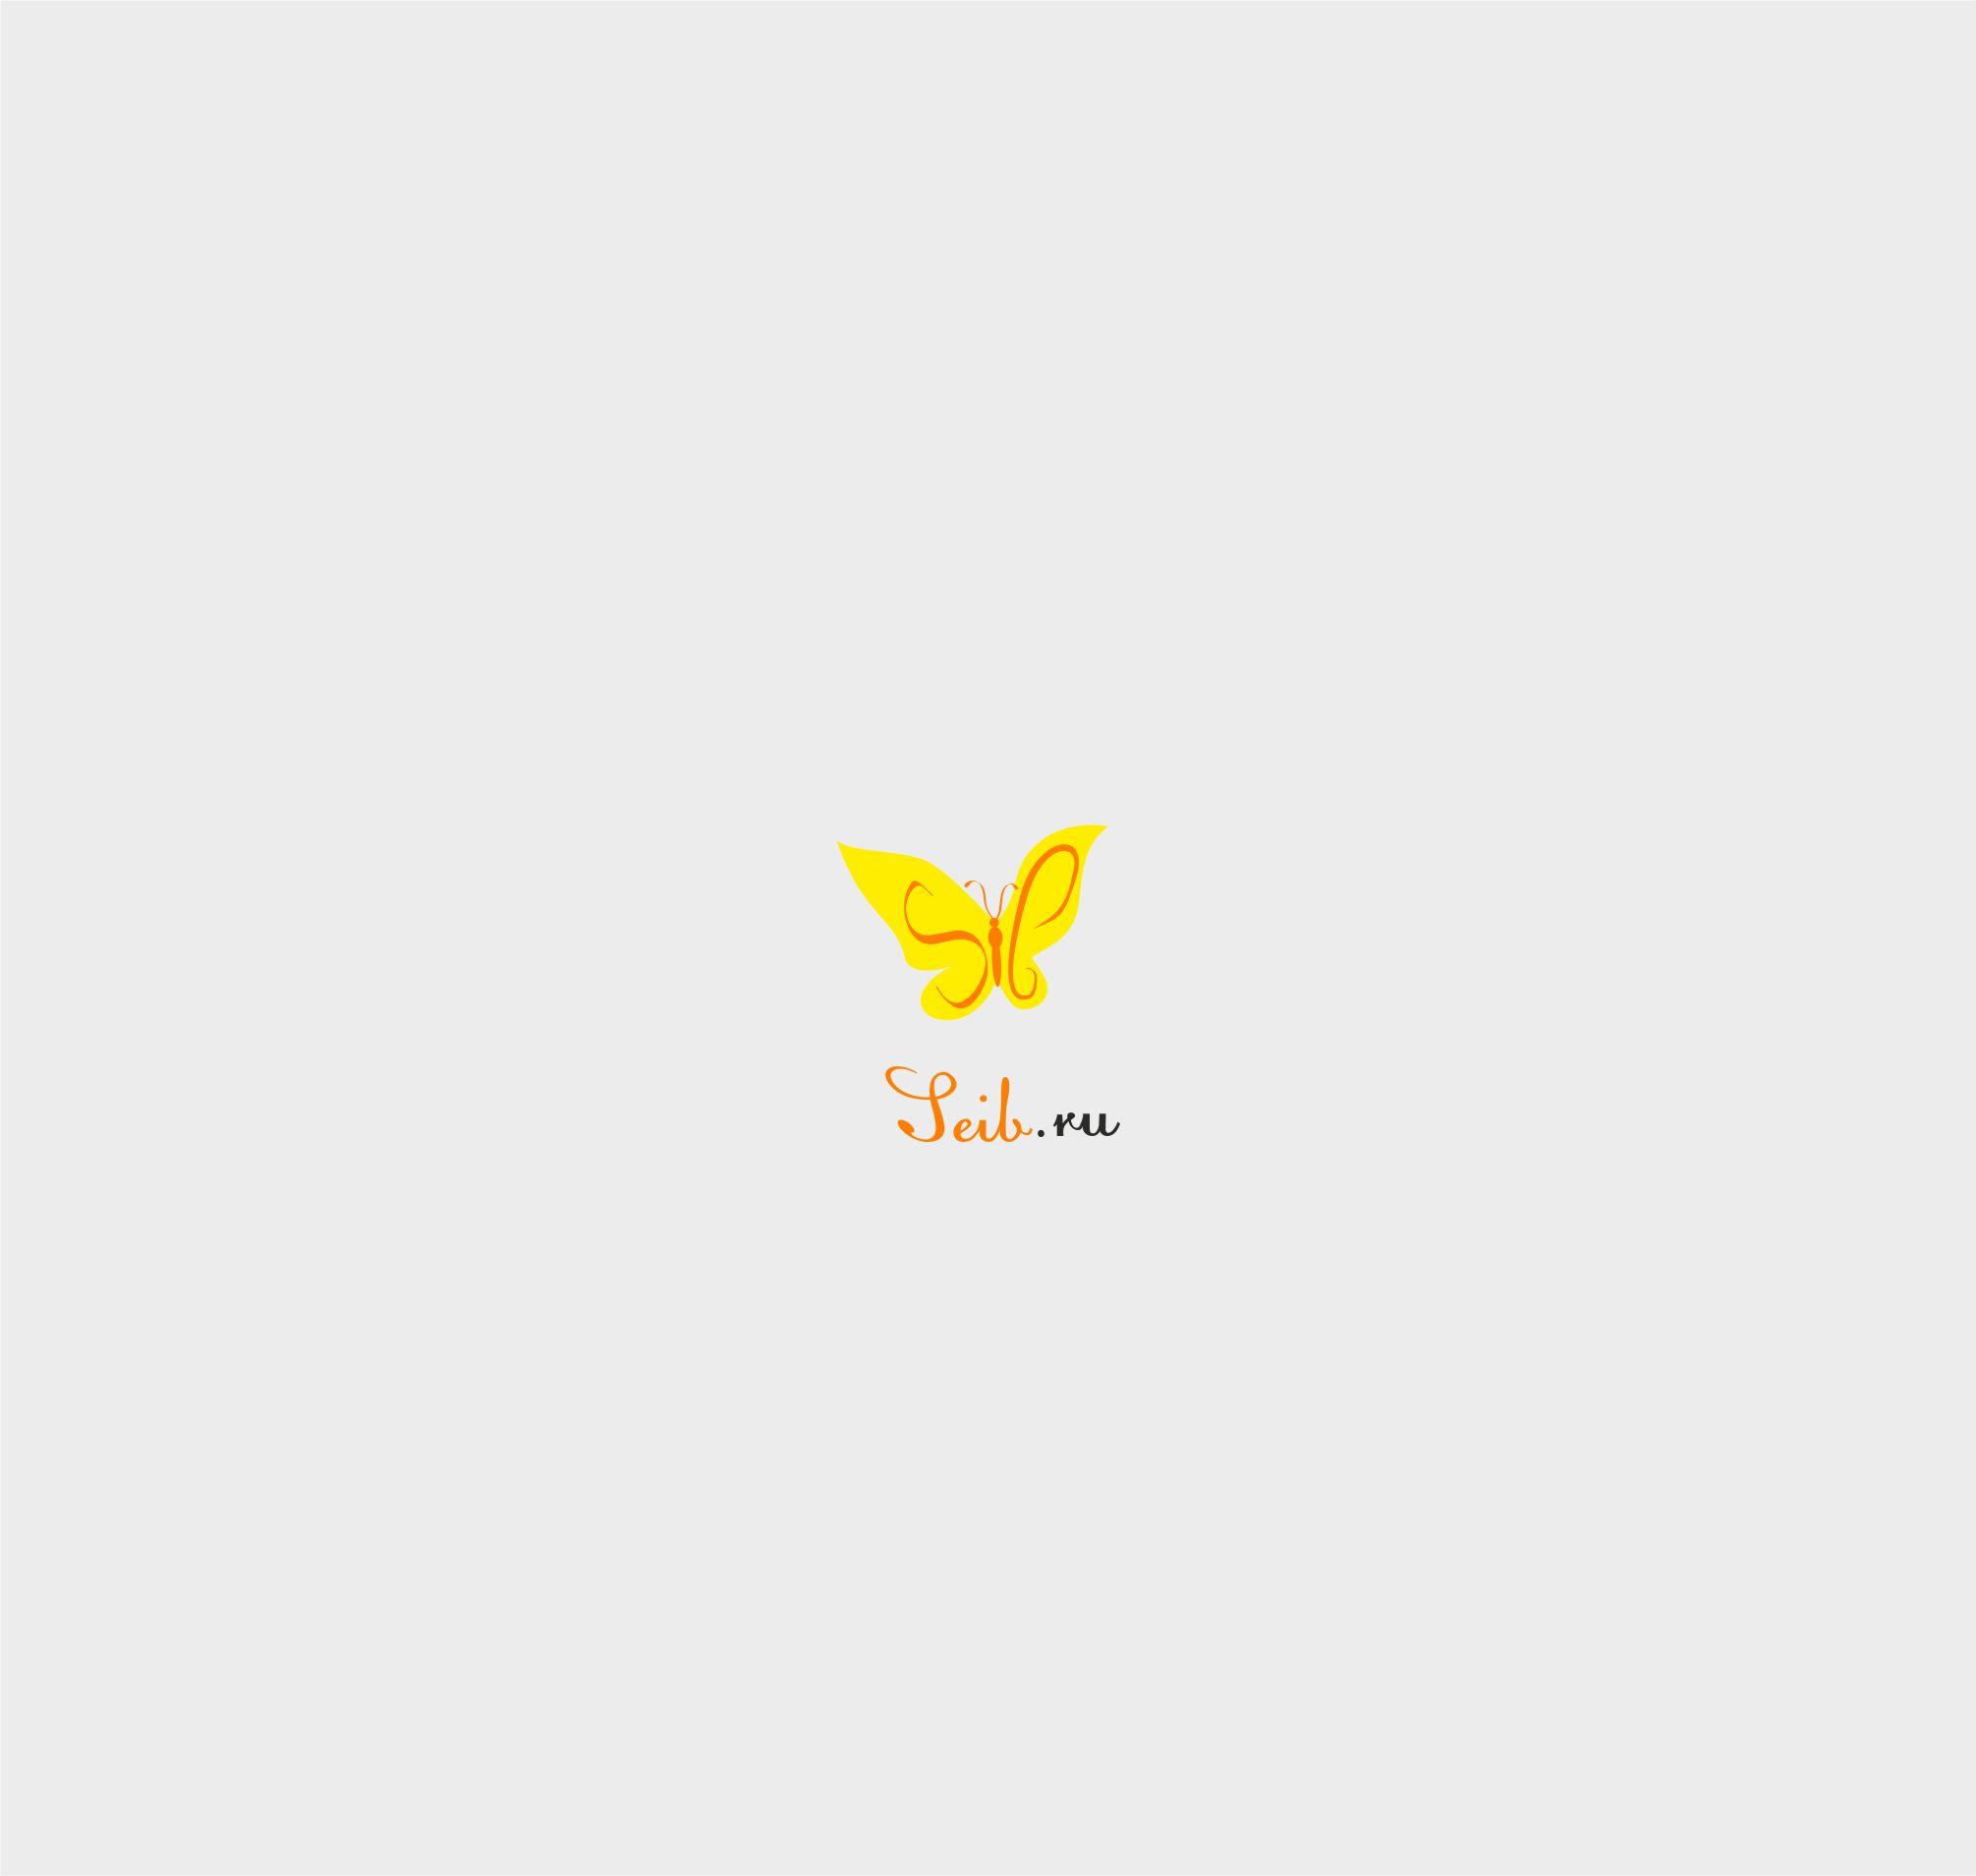 Логотип для инвестиционной компании фото f_5275140d51d33039.jpg